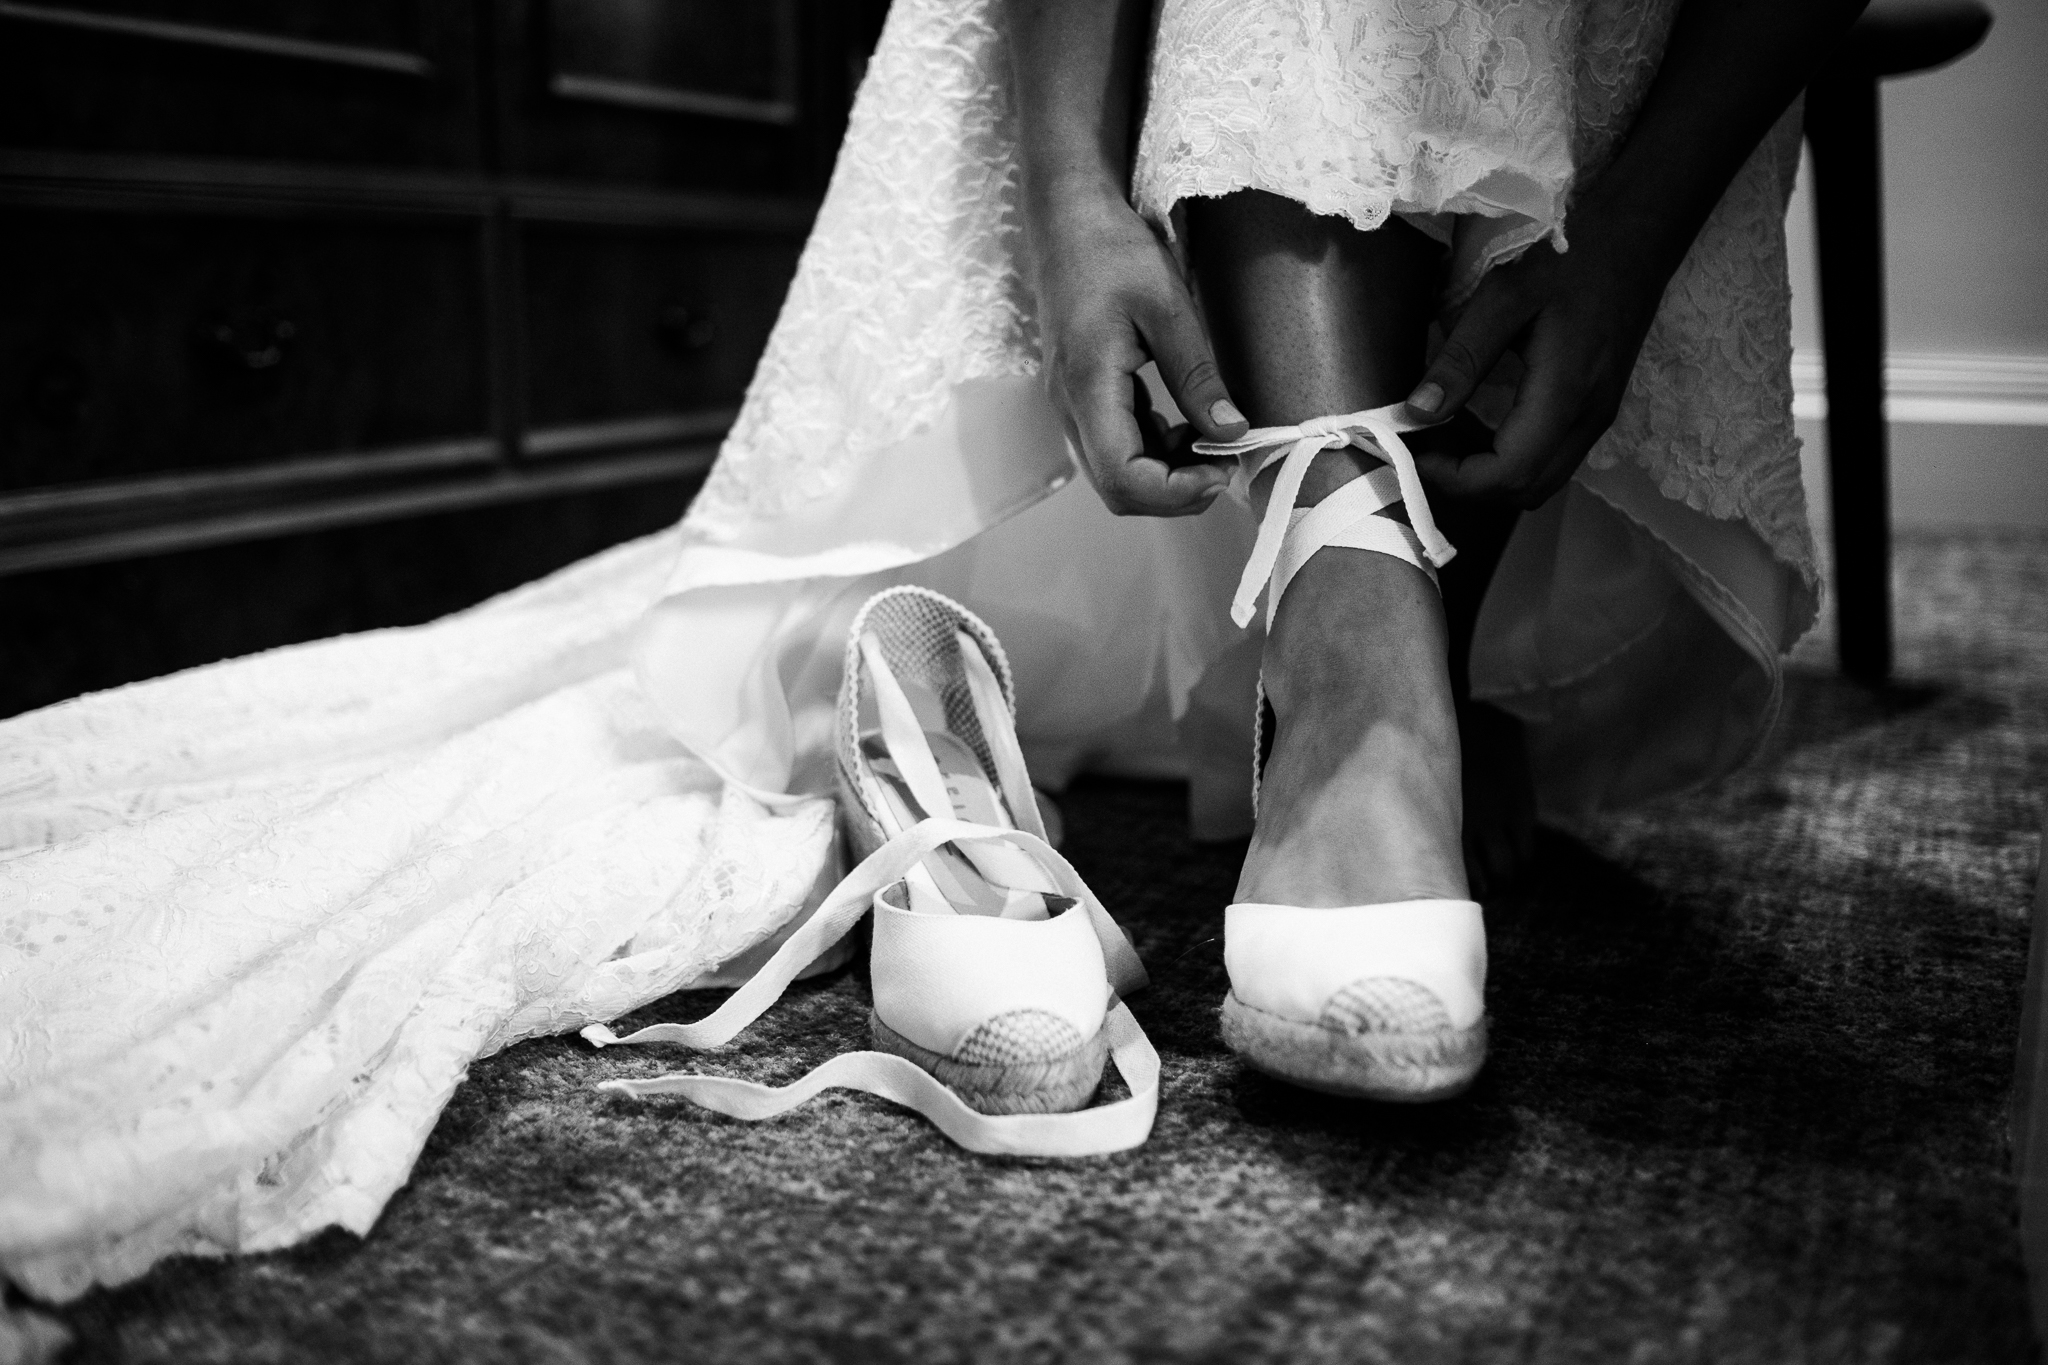 Relaxed Documentary Wedding Photography at The Wizard Inn, Alderley Edge Cheshire - Jenny Harper-10.jpg